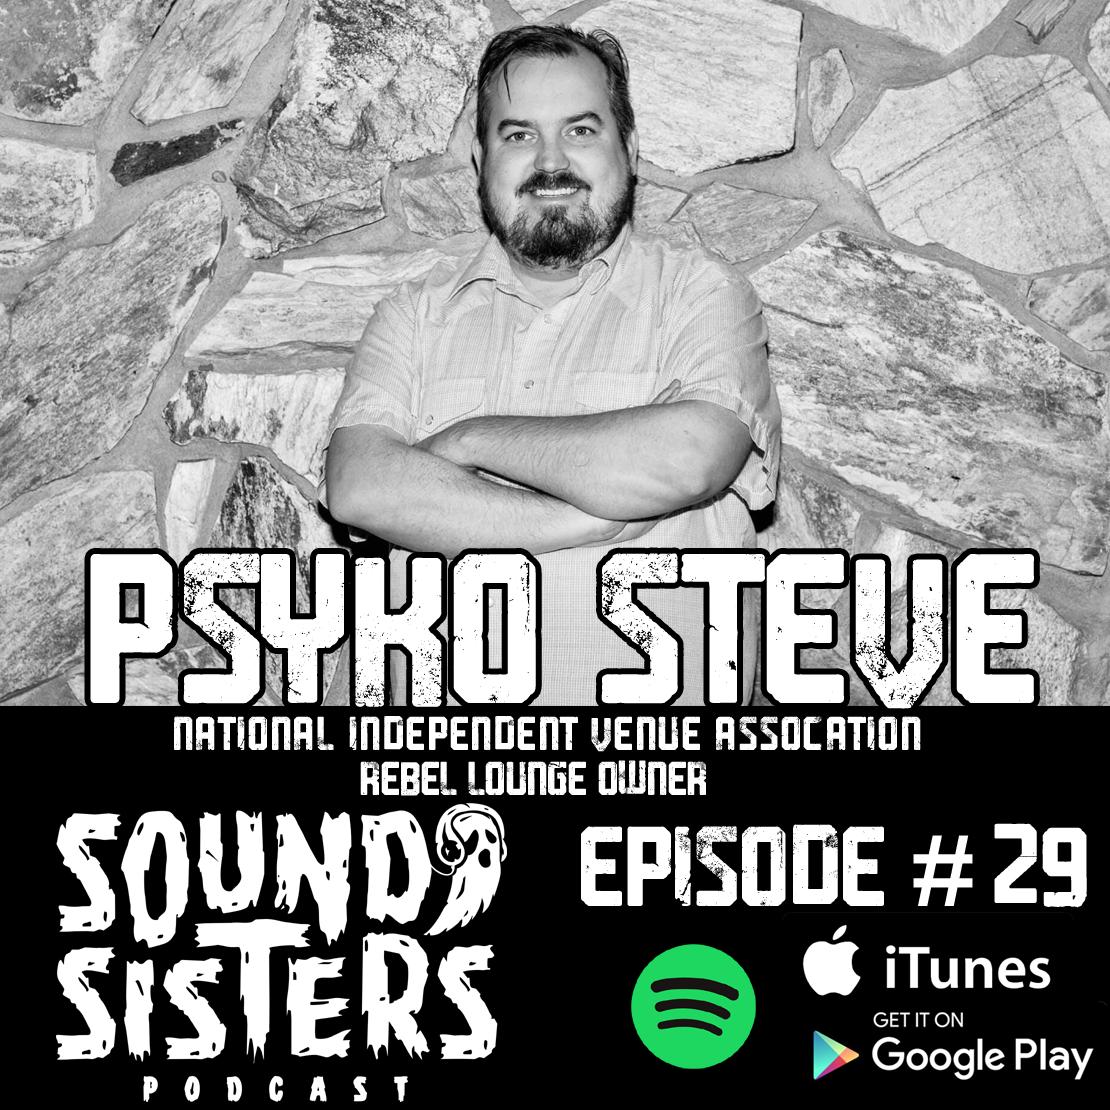 Sound Sisters 29 – Stephen 'Psyko Steve' Chilton